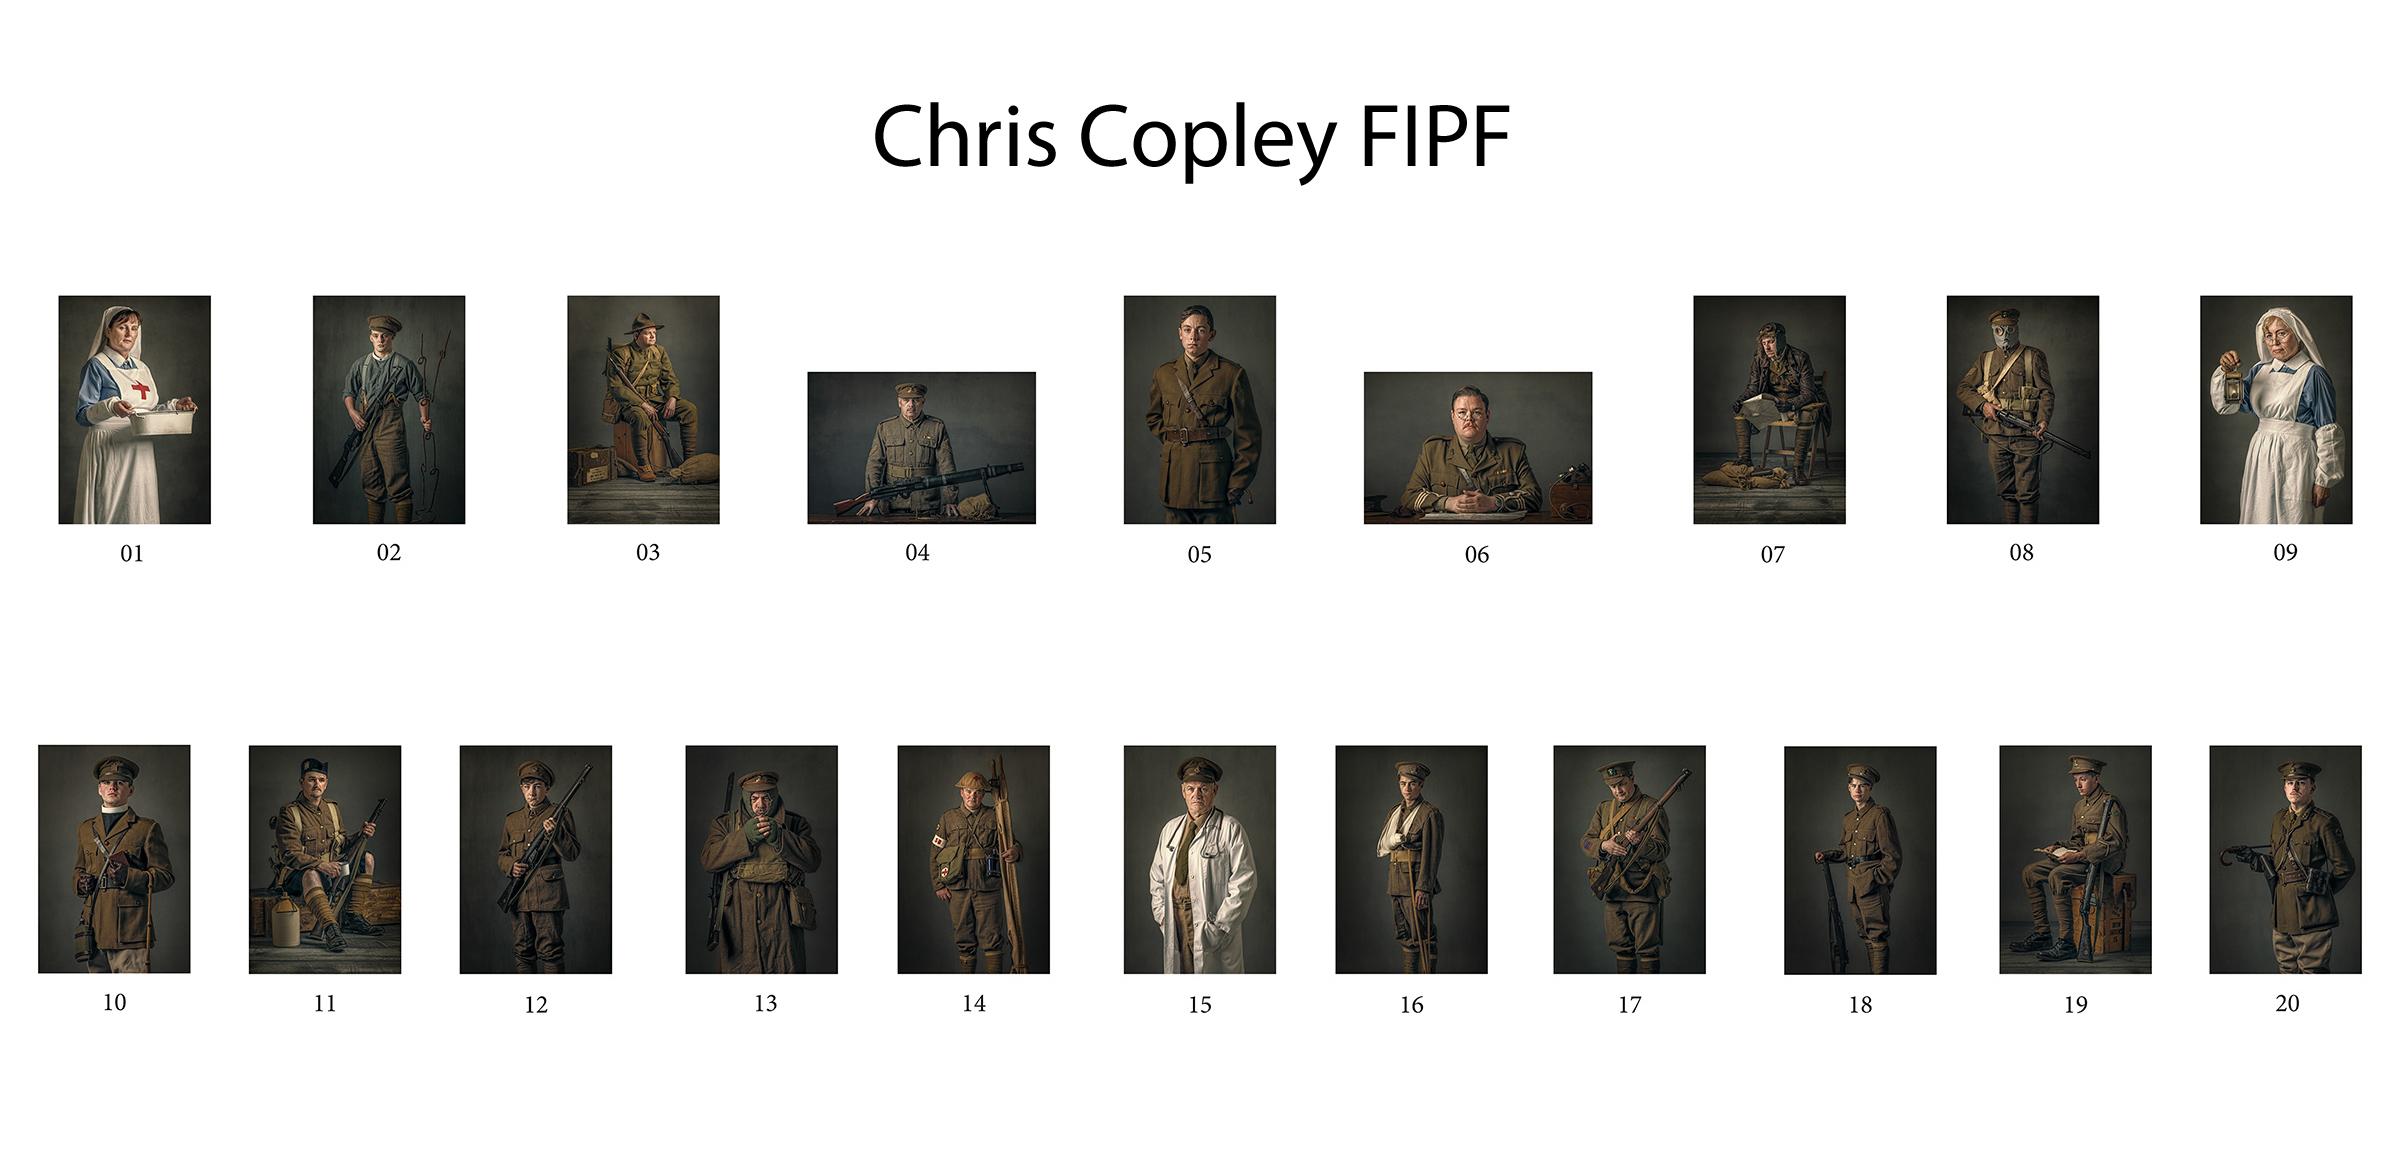 ChrisCopley